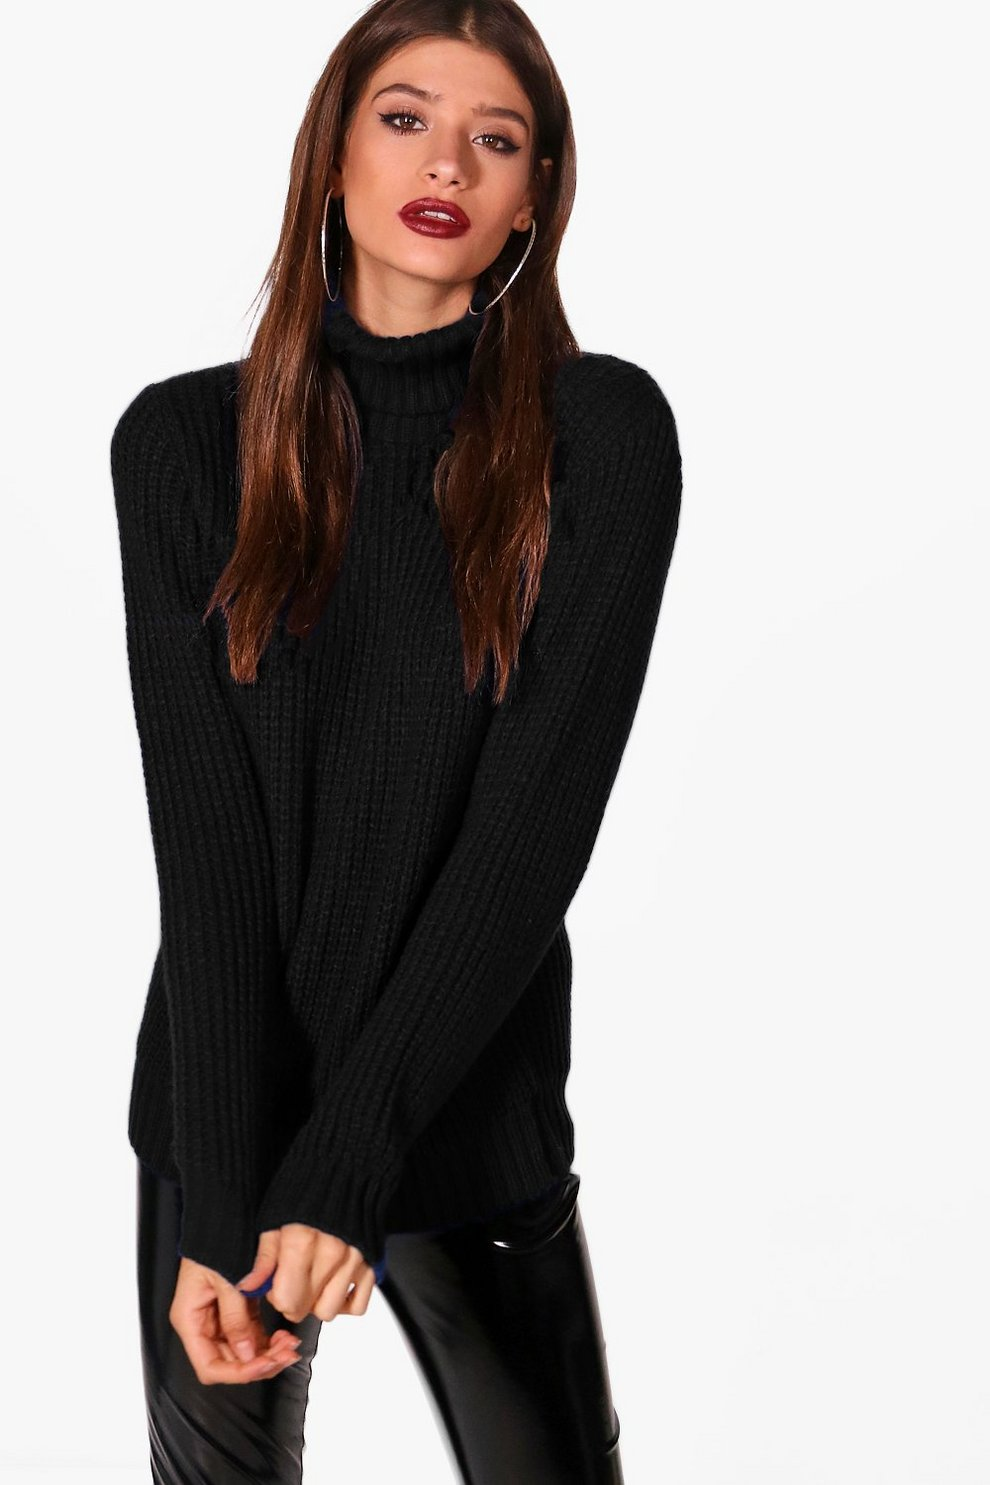 e2cc5b0e Womens Black Soft Knit Oversized Roll Neck Jumper